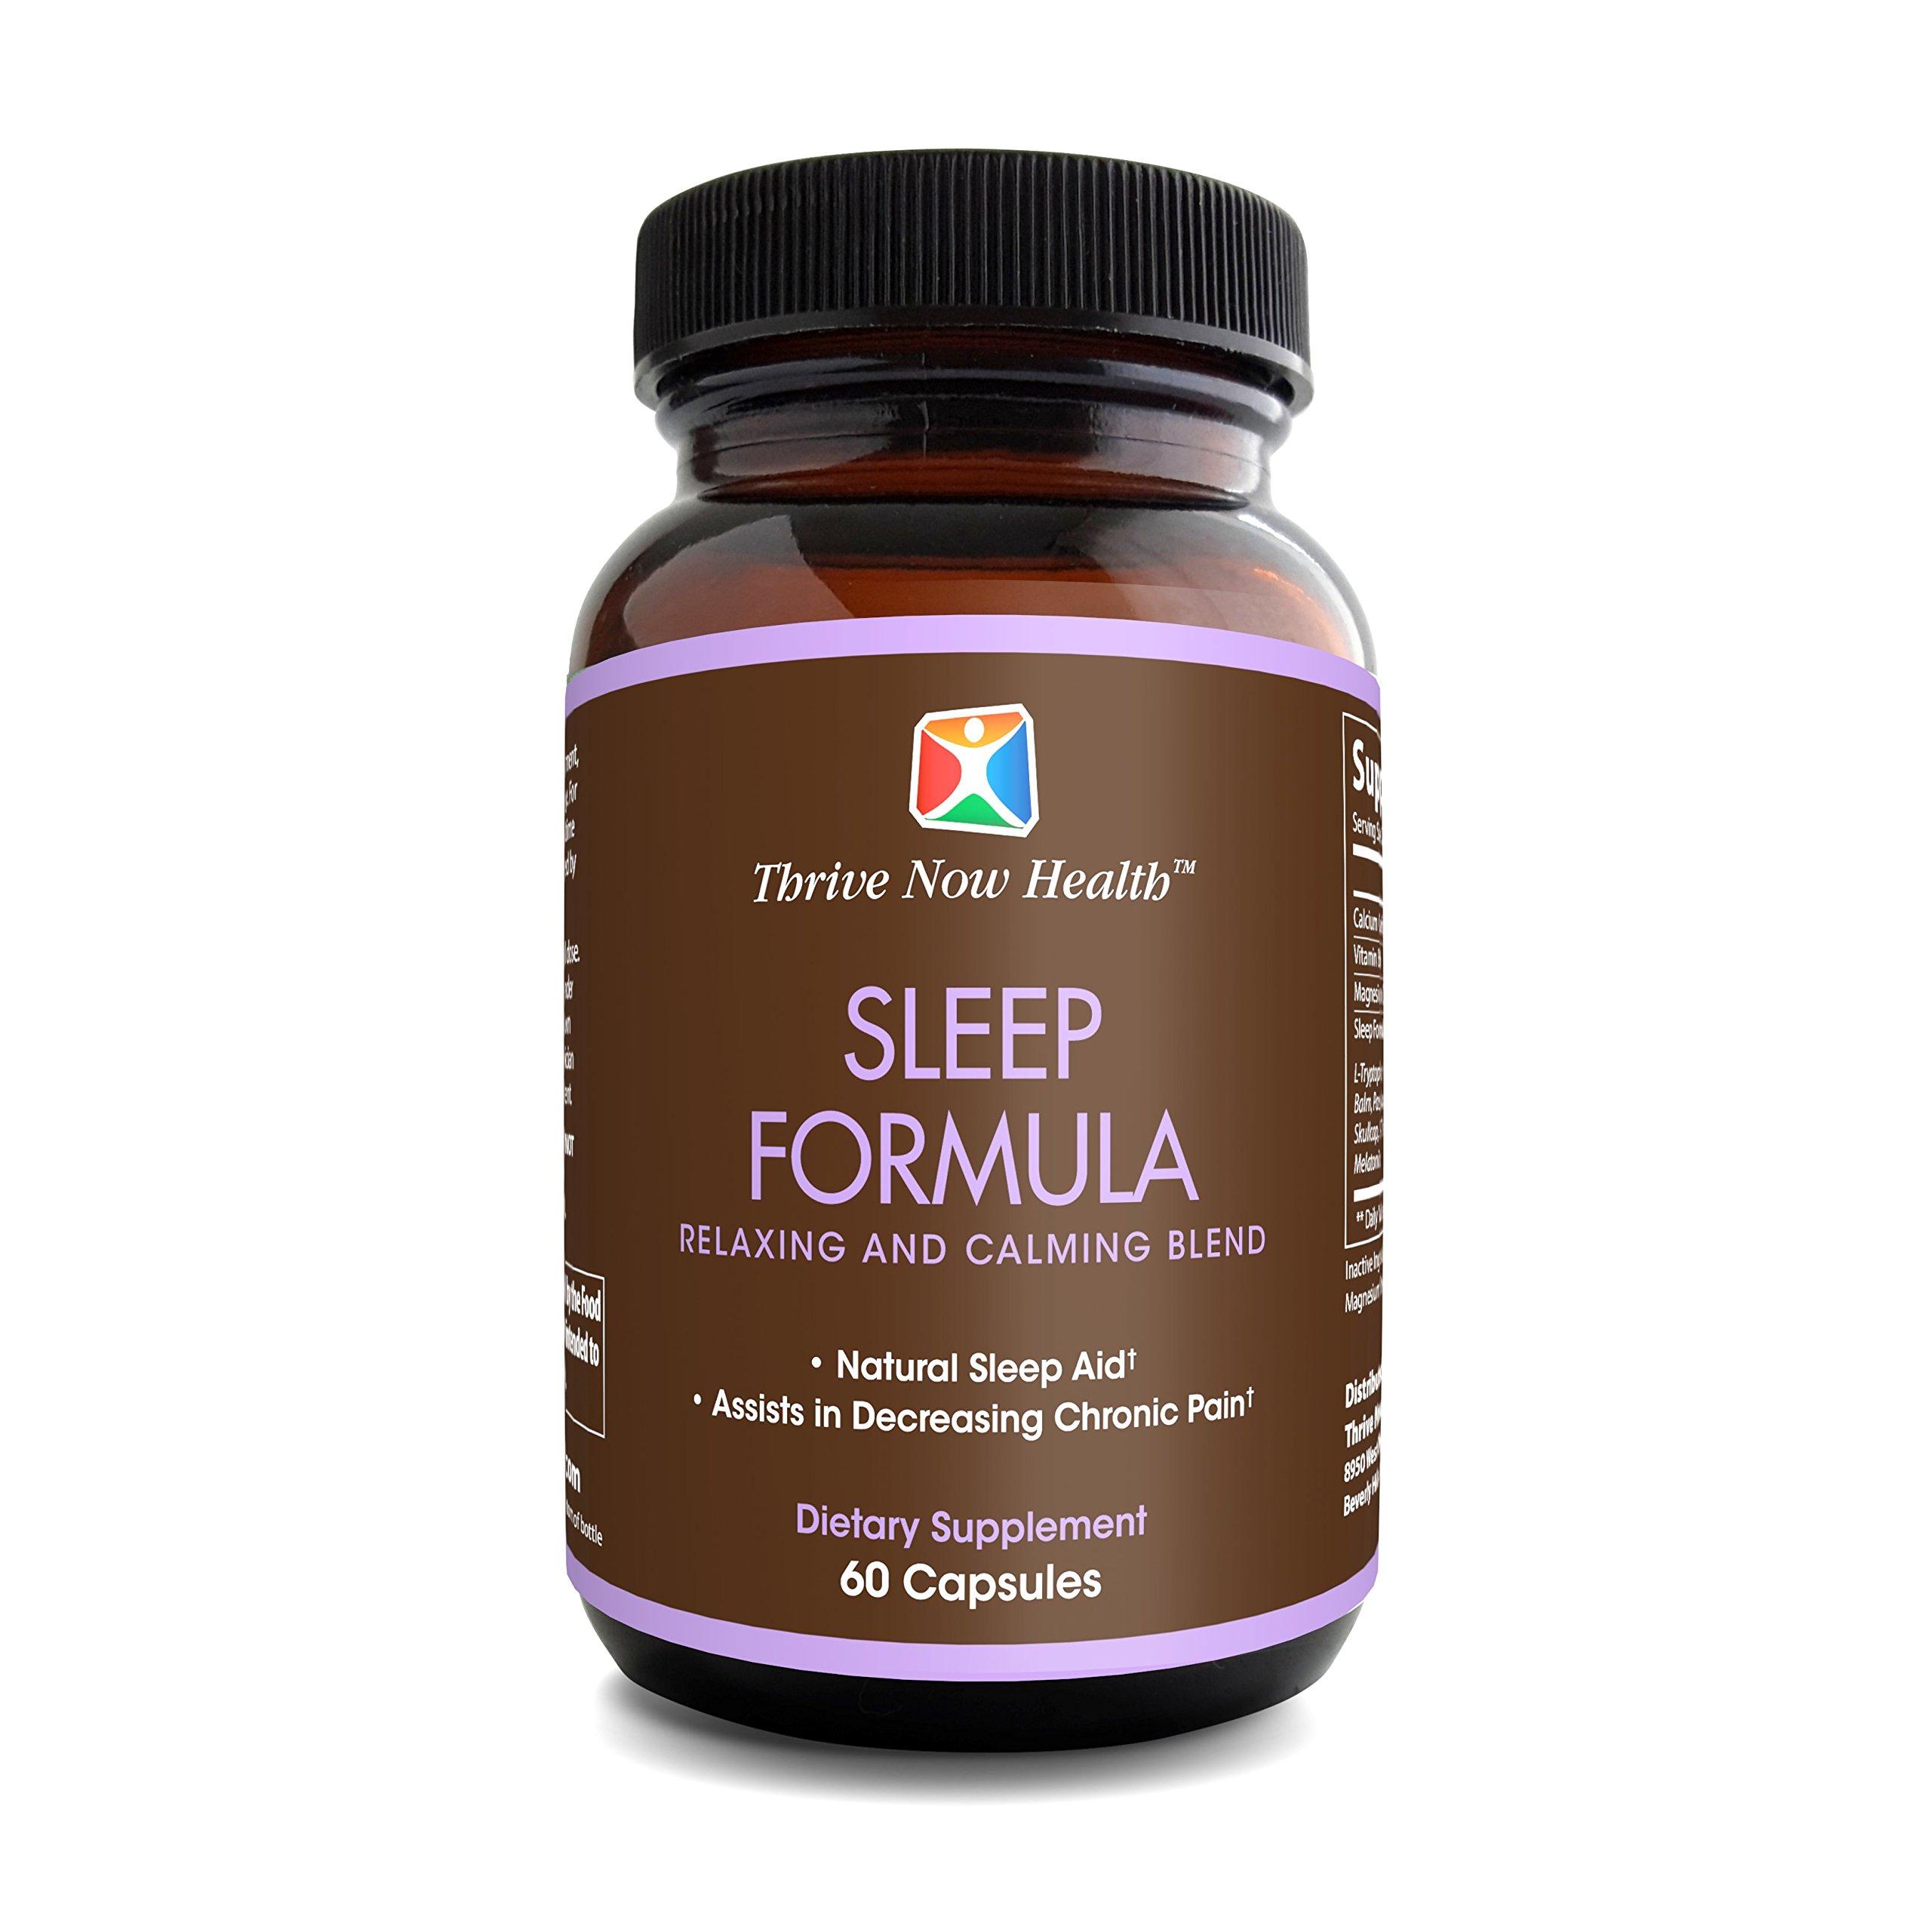 Thrive Now Health Sleep Formula w/ Melatonin (60 Capsules) Natural Sleeping Aid | Vitamin B, L-Theanine, St. John's Wart | Deep, Restful Support | Men and Women